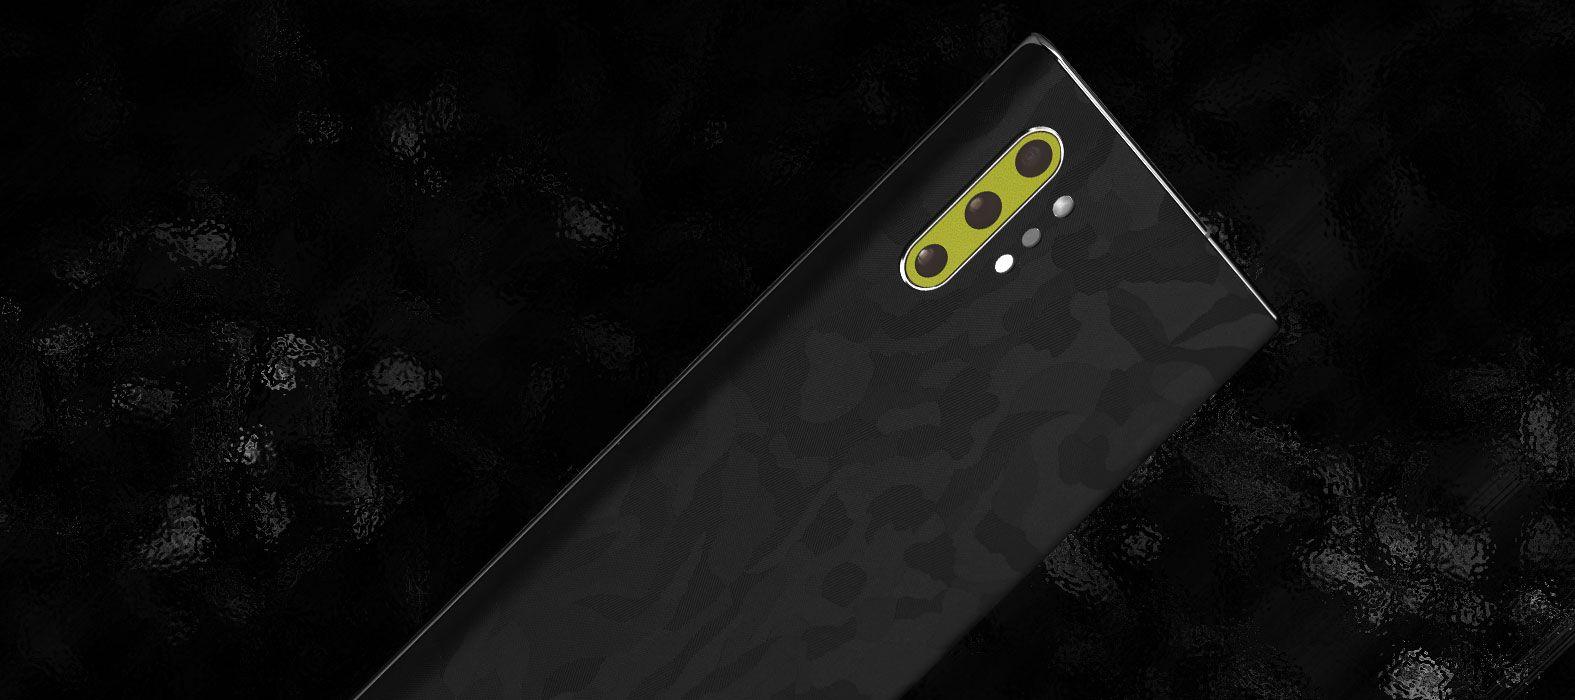 Galaxy-Note-10-Plus-Black-Camoflaunt